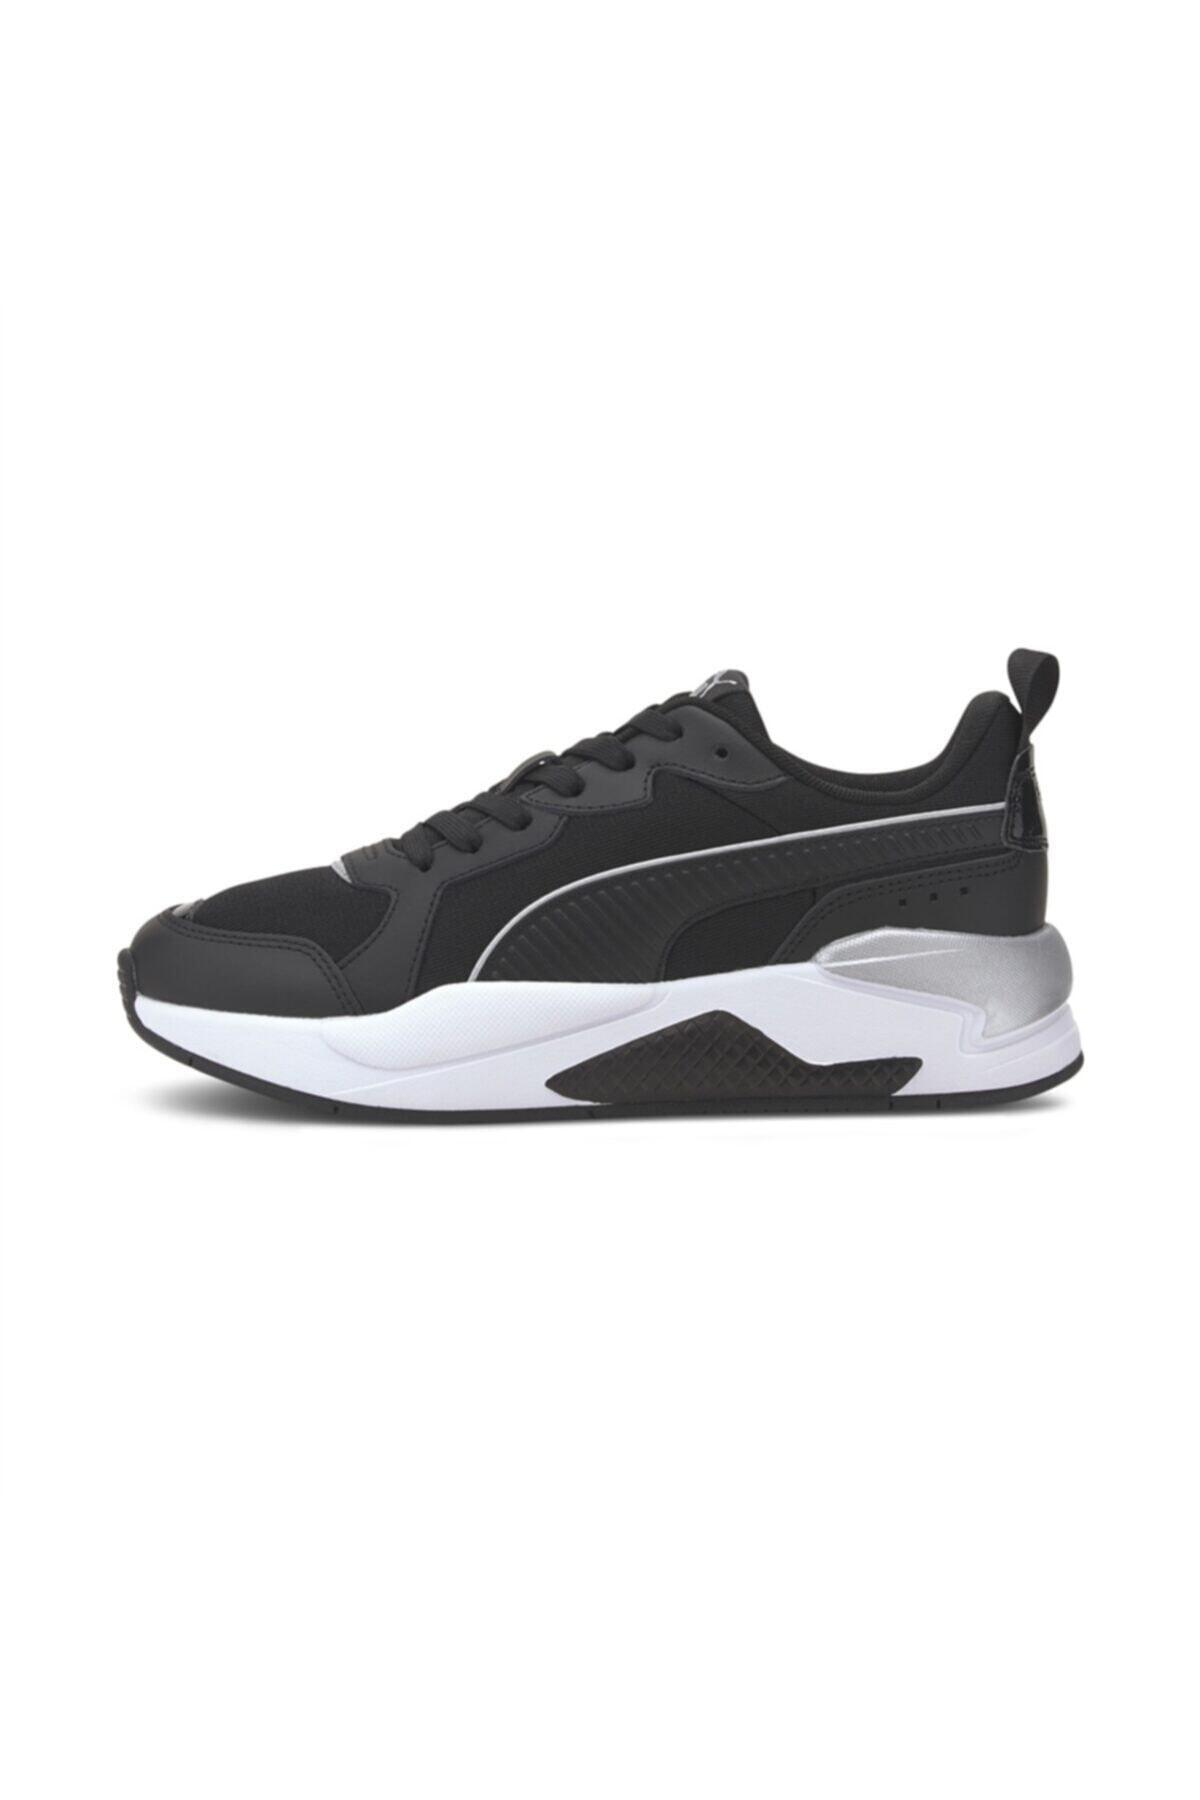 Puma X-RAY PATENT WN S PUMA BL Siyah Kadın Sneaker Ayakkabı 101085444 2